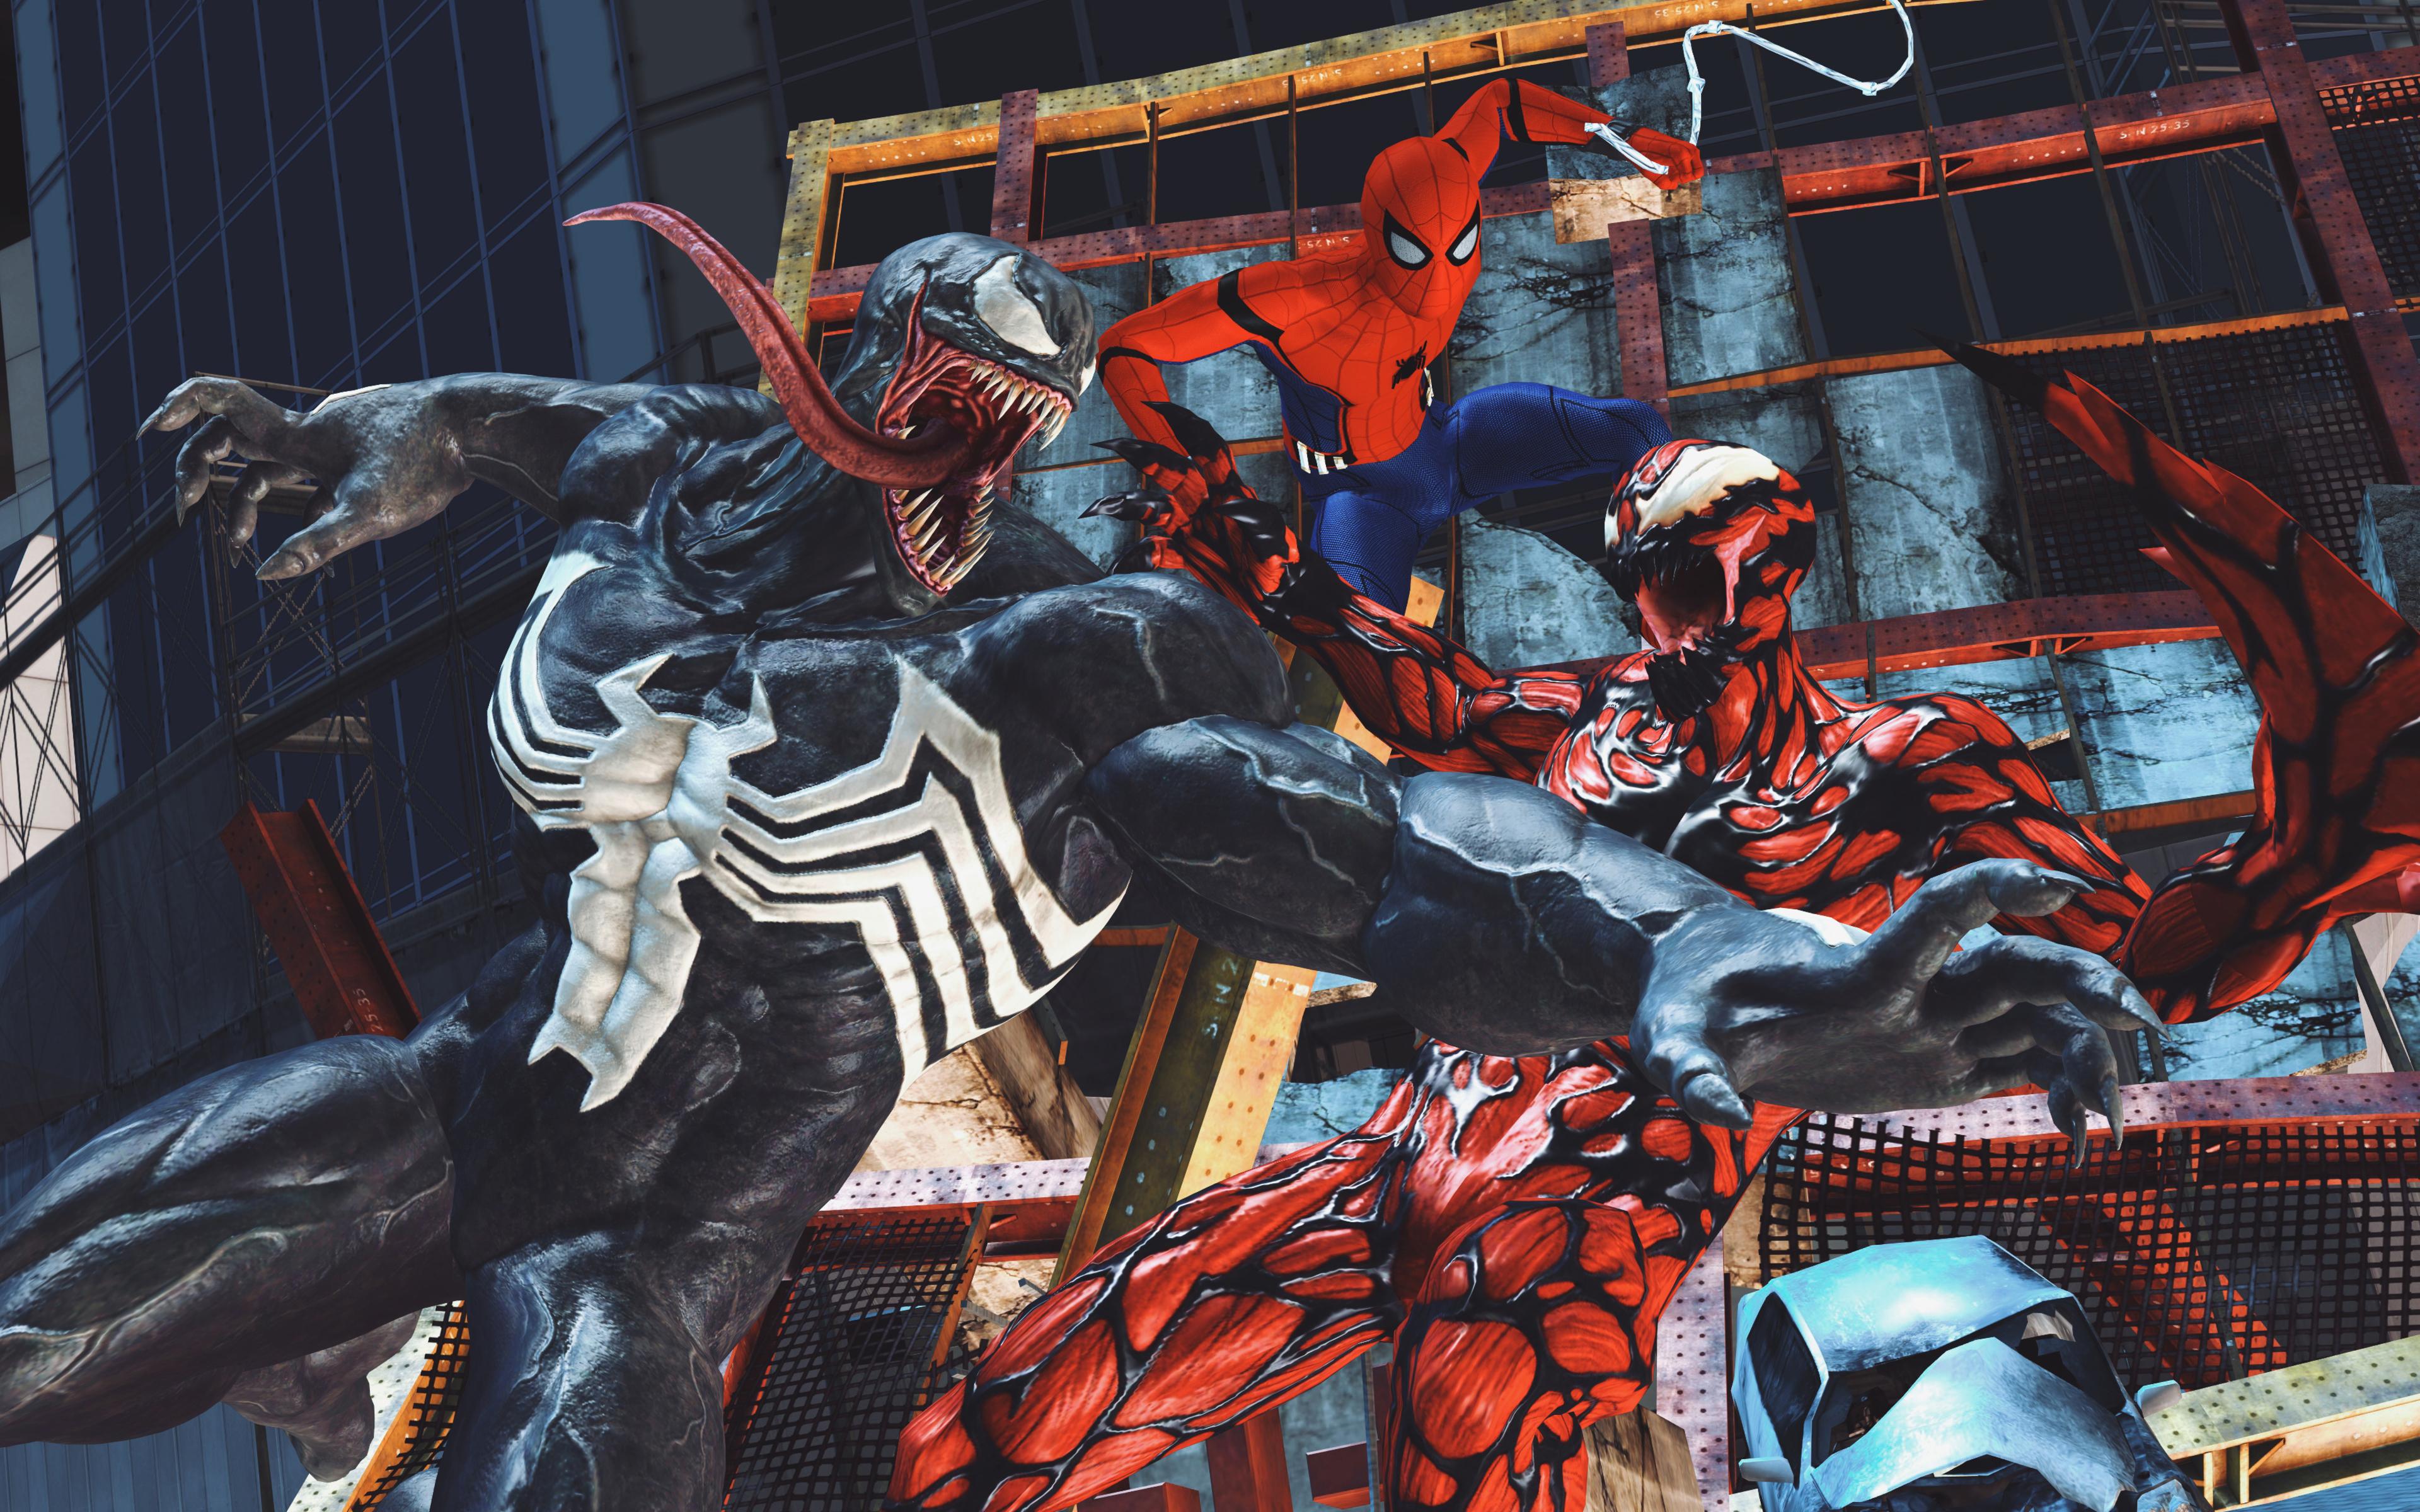 3840x2400 Carnage Venom Spiderman Artwork 4k 4k HD 4k ...